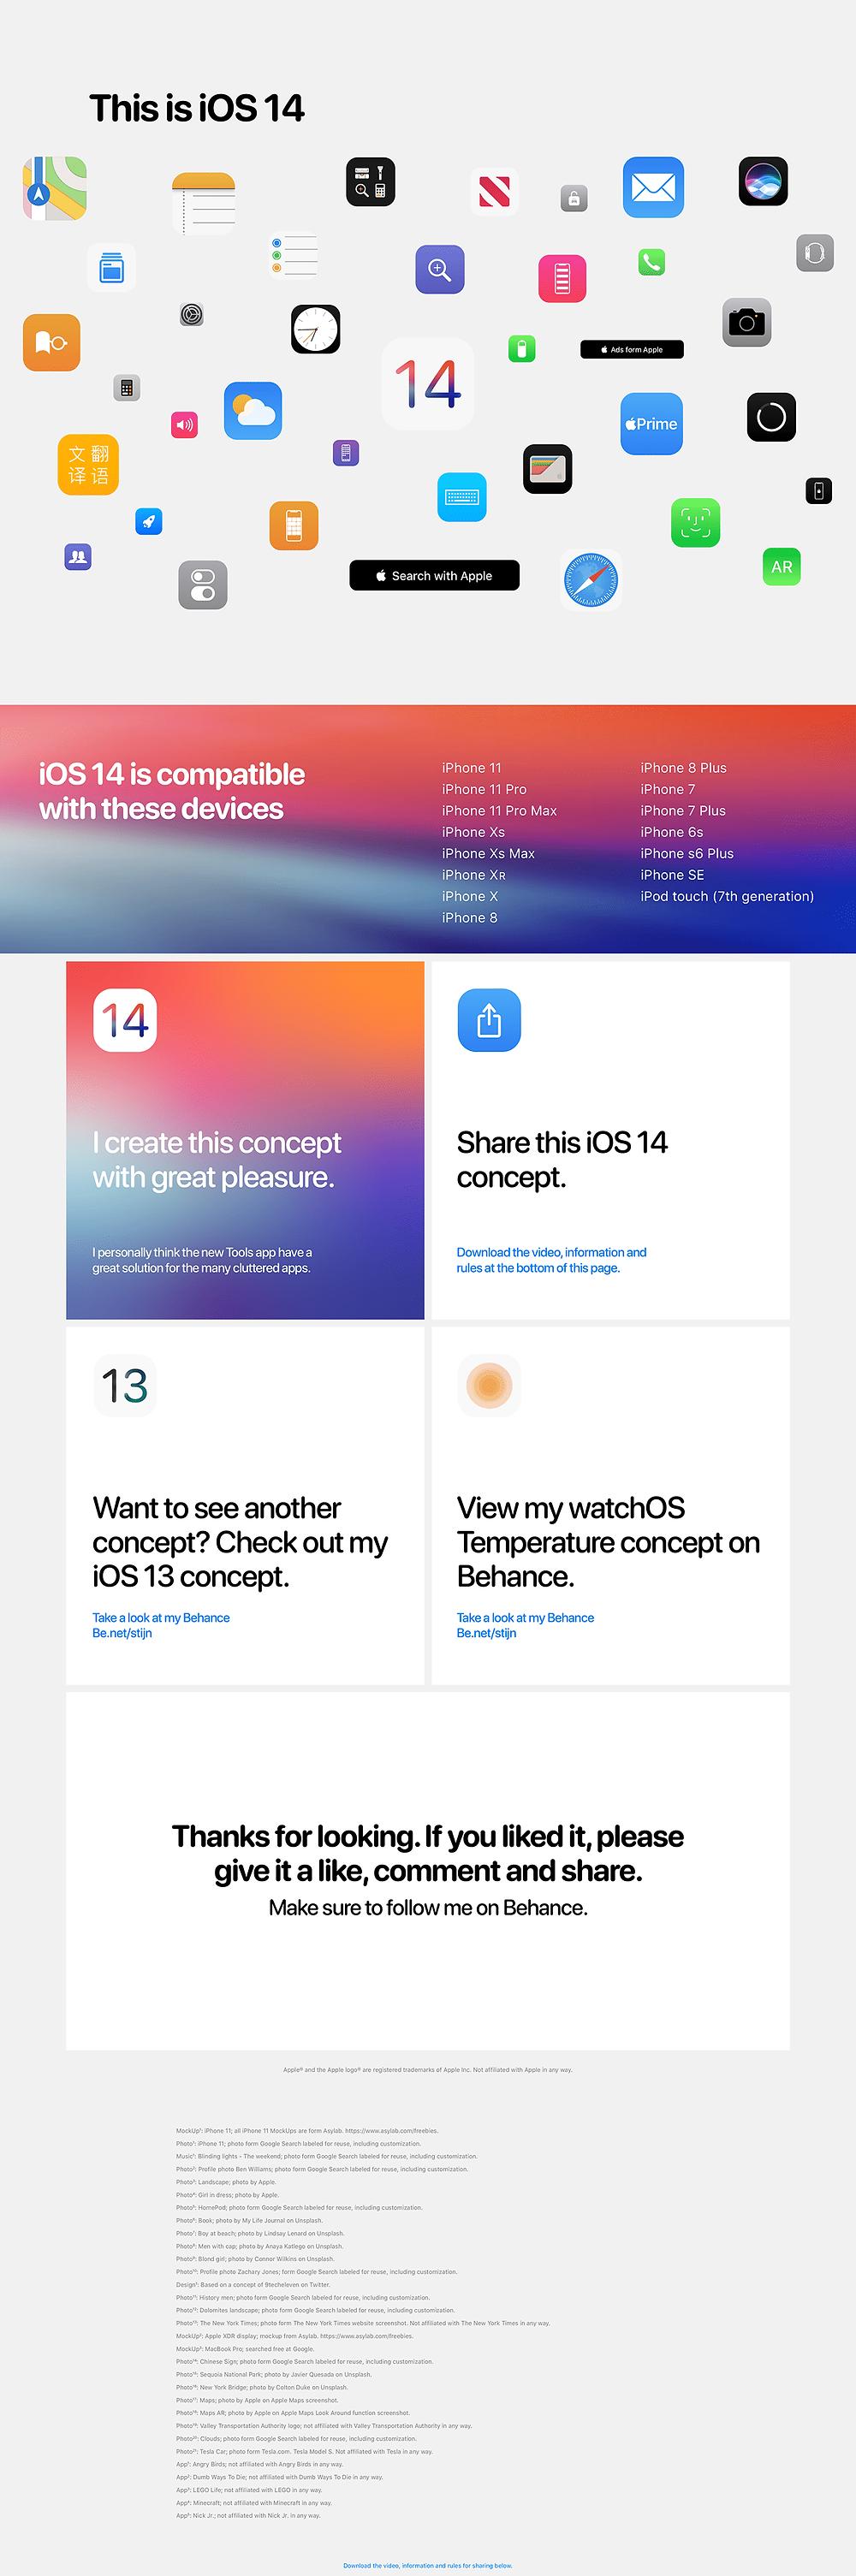 ios 14, ios 2020, ios 14 concept, ios 14 2020, ios 14 release date, ios 14 concepts, apple concept, ios 14,